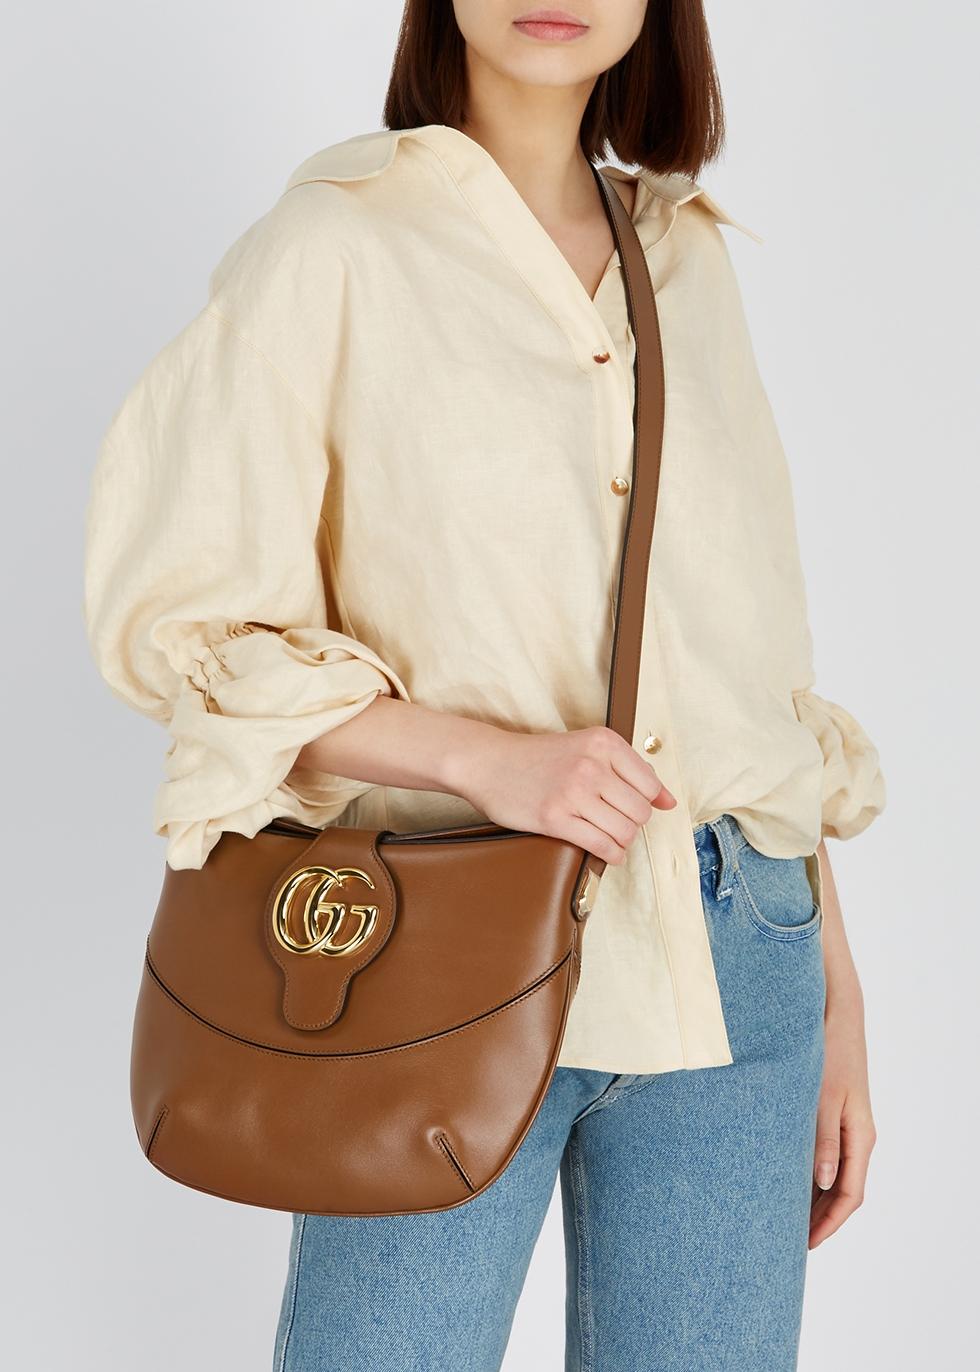 Arli medium brown leather shoulder bag - Gucci